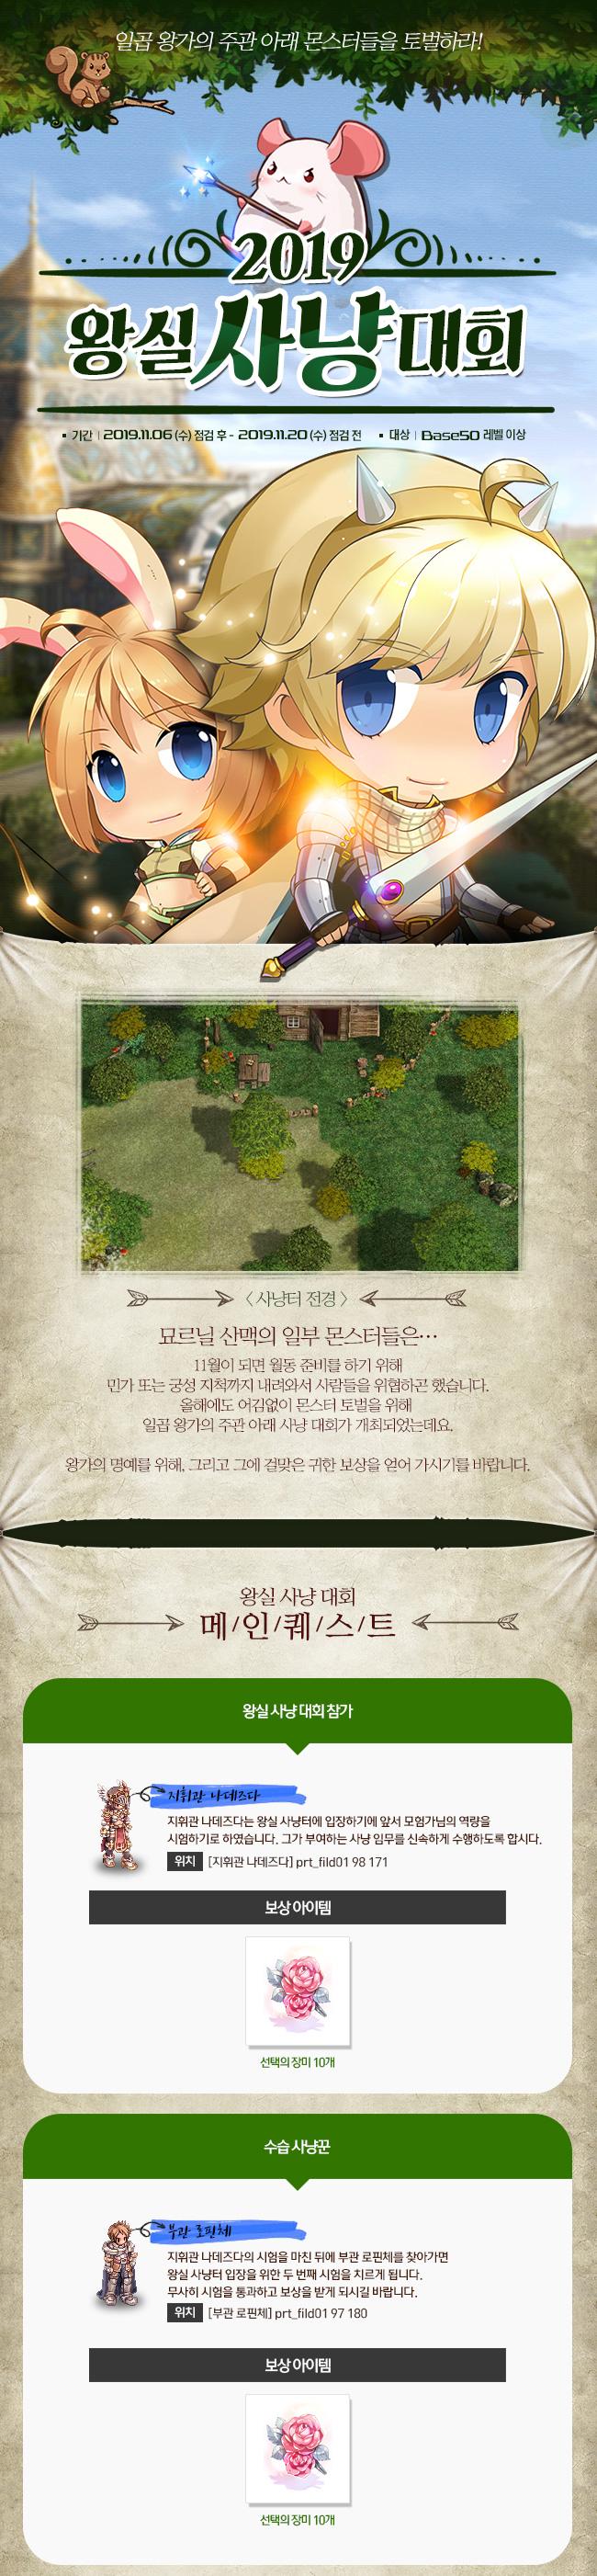 [RO1]_2019 왕실 사냥대회 image 1